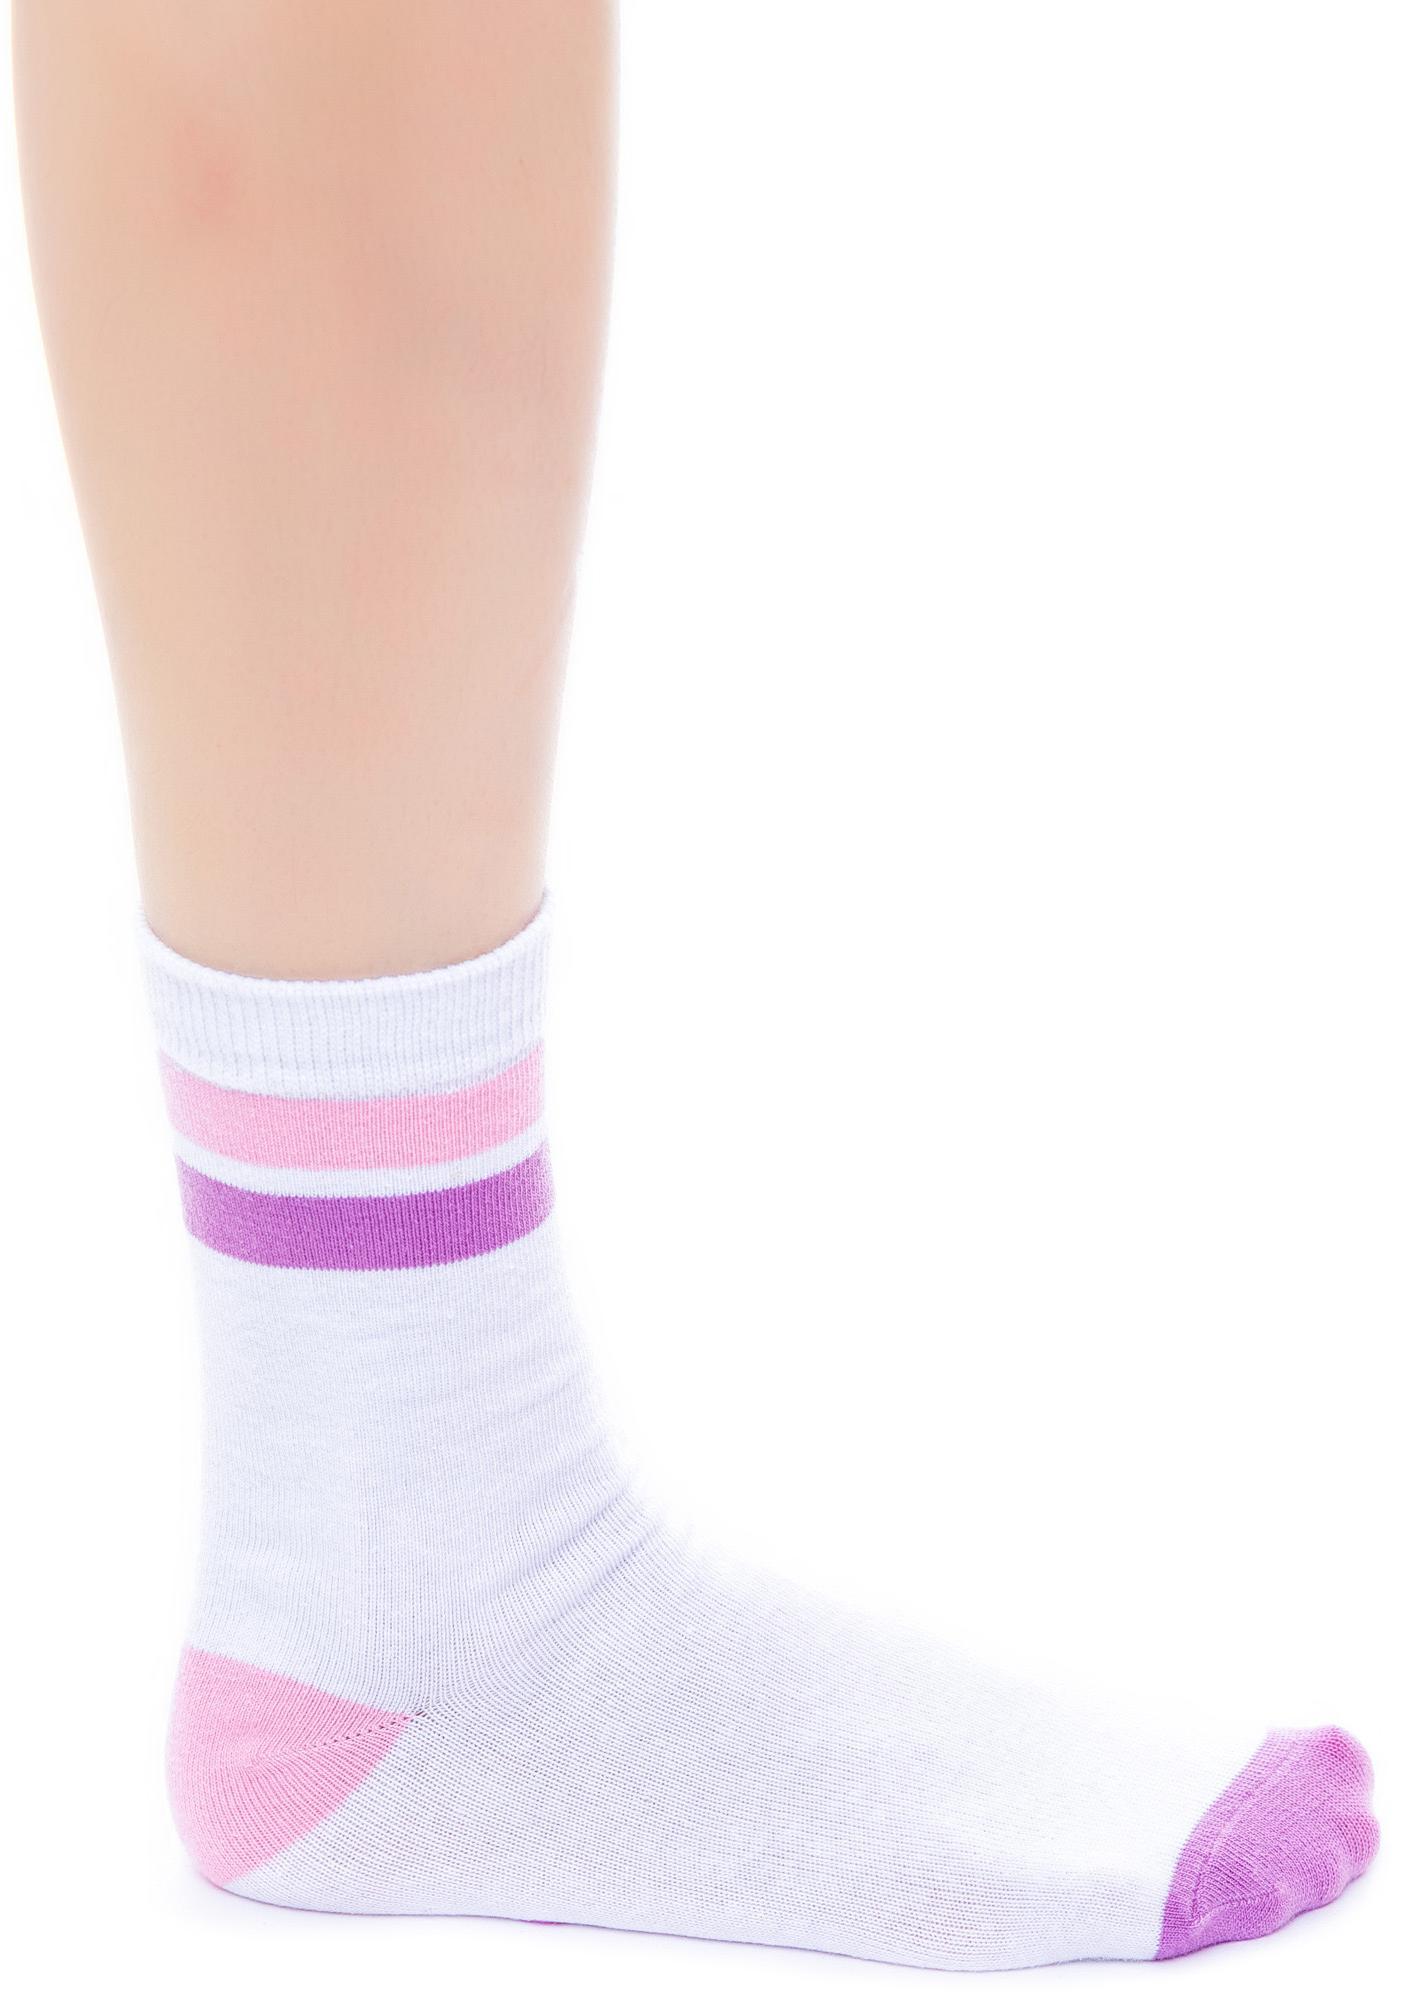 Kutie Kawaii Socks